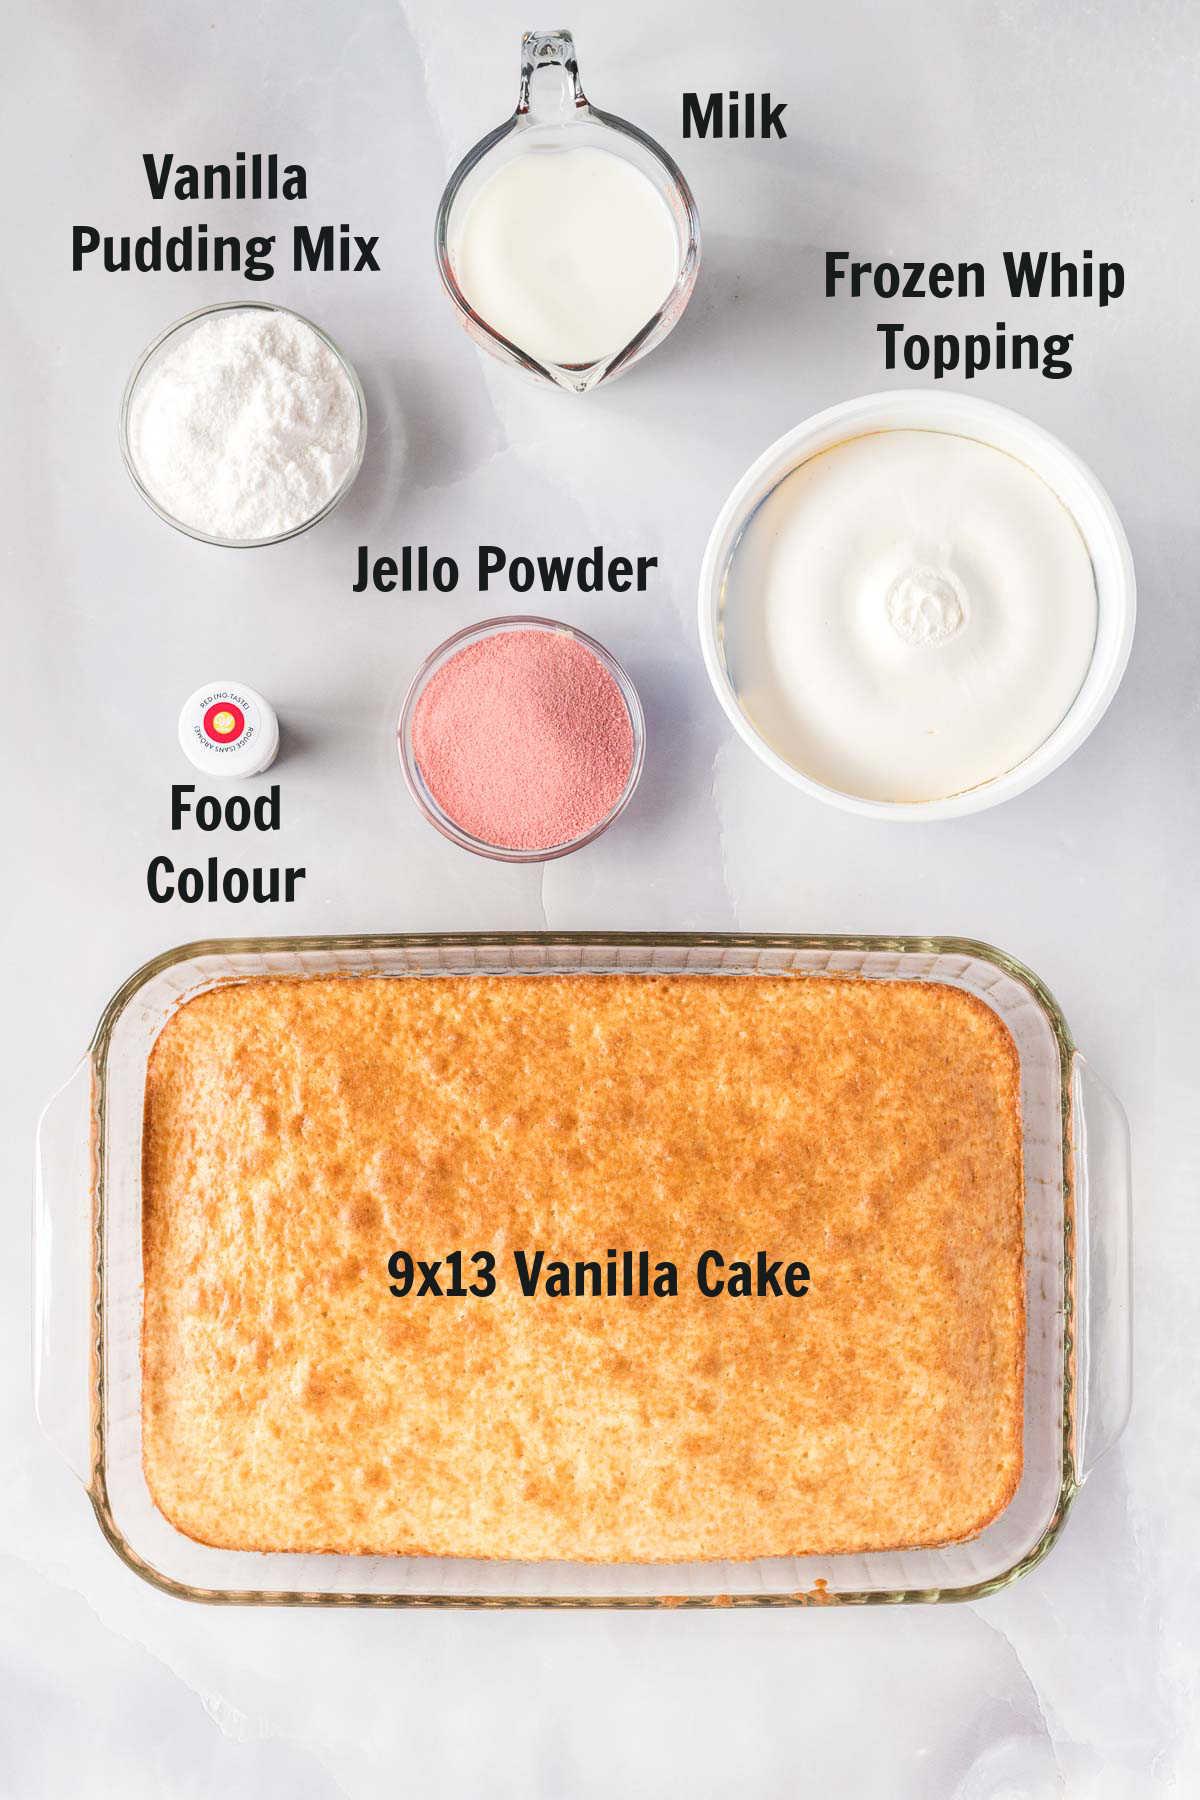 Ingredients to make jello poke cake.